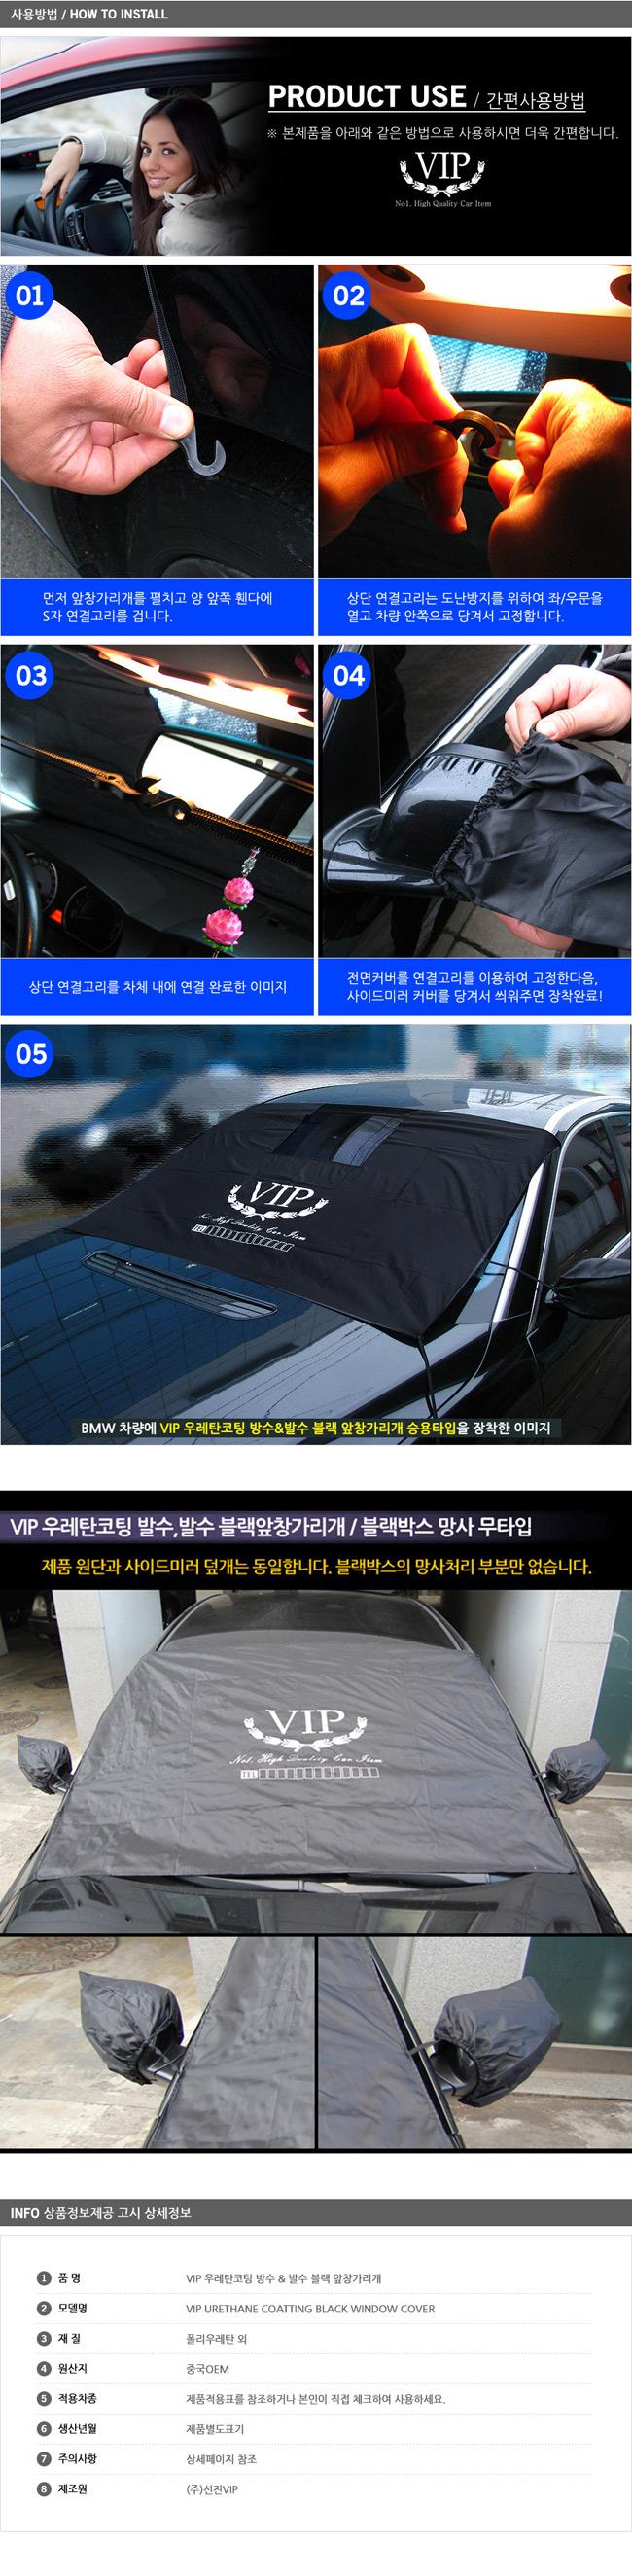 VIP 우레탄코팅 발수,방수 블랙 앞창가리개